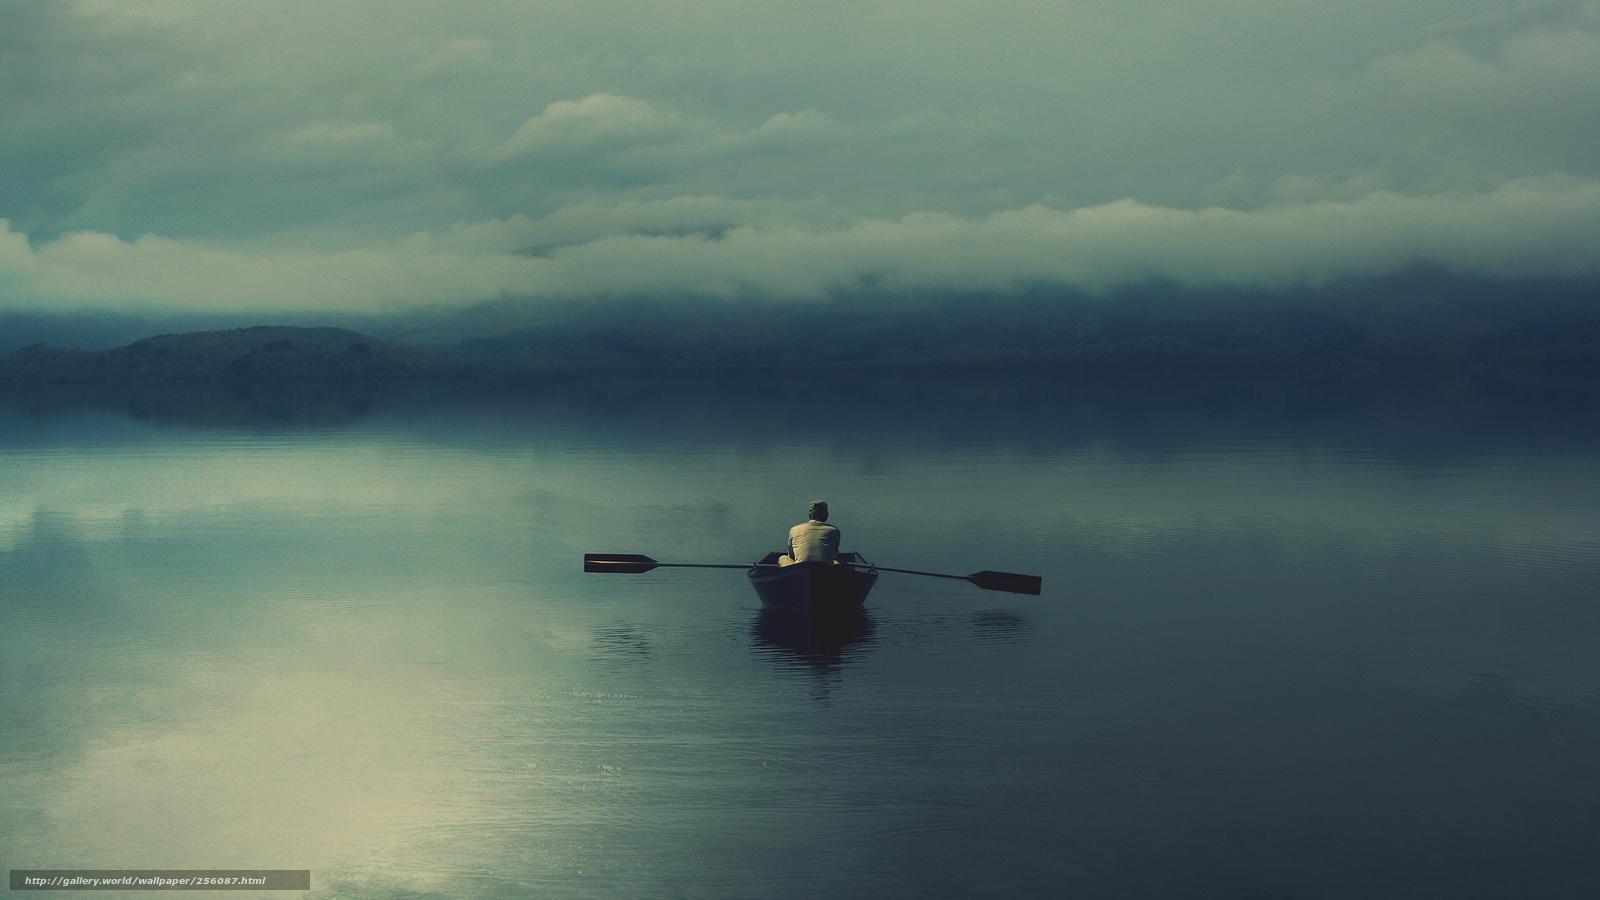 в течении реки мы заметили лодку